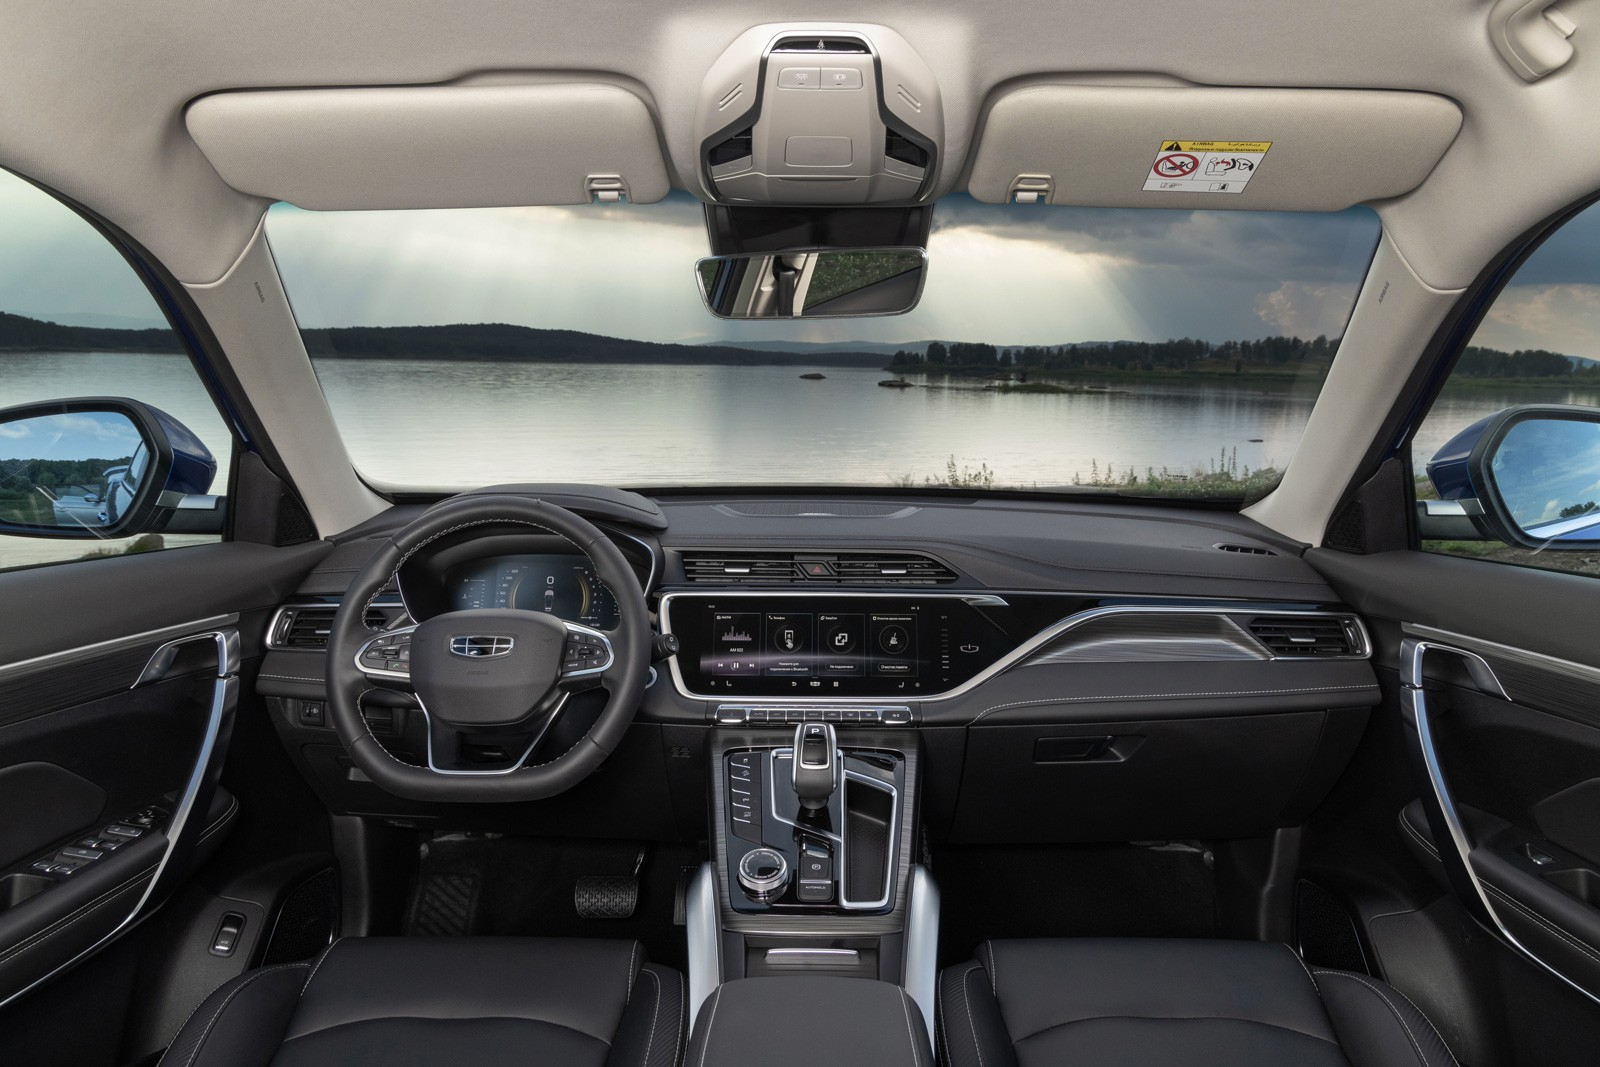 Три цилиндра от Volvo, гибрид и сложности с подключением айфона: тест Geely Atlas Pro